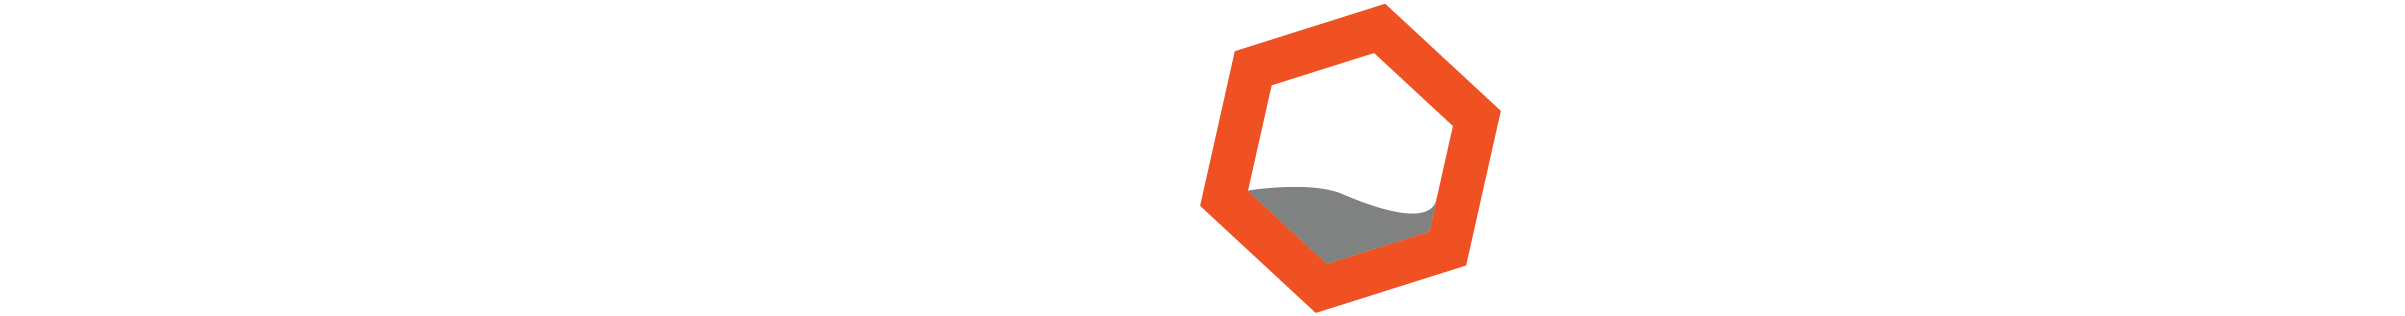 Buzzworthy integrated marketing logo